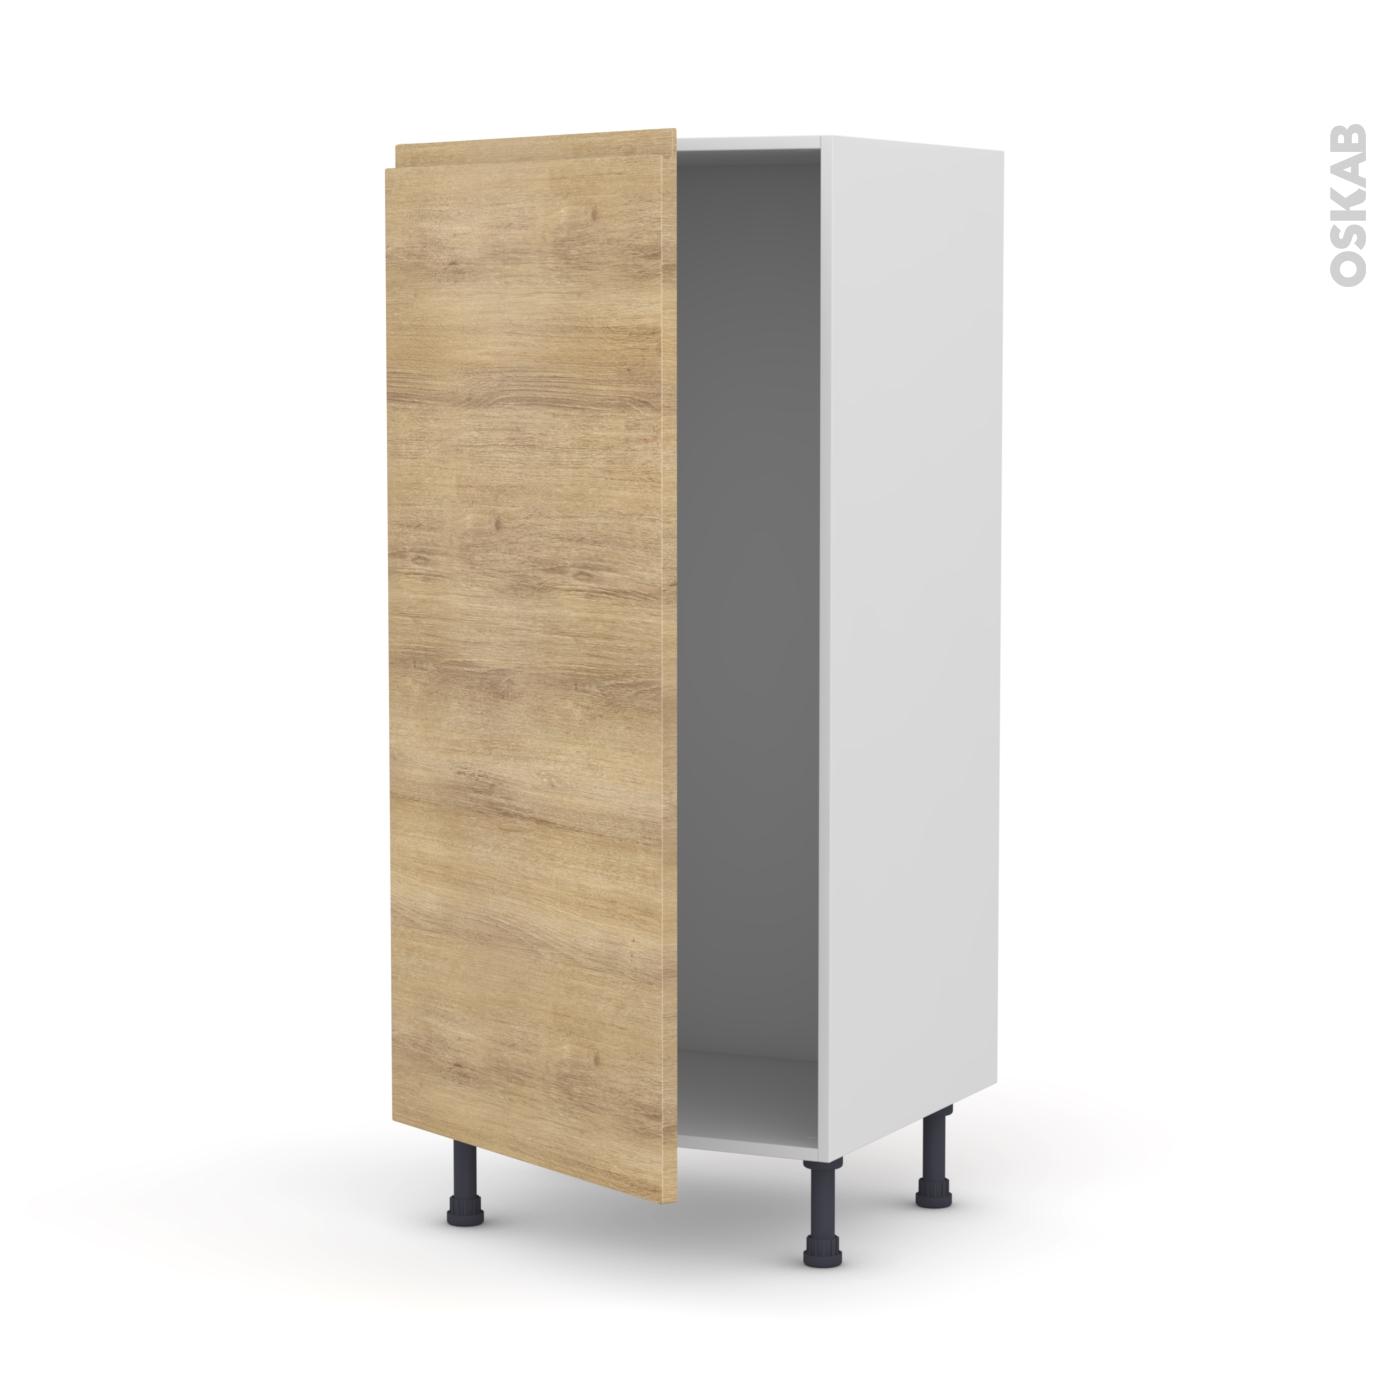 Dimension Frigo Encastrable Ikea colonne de cuisine n°27 armoire frigo encastrable ipoma chêne naturel, 1  porte, l60 x h125 x p58 cm